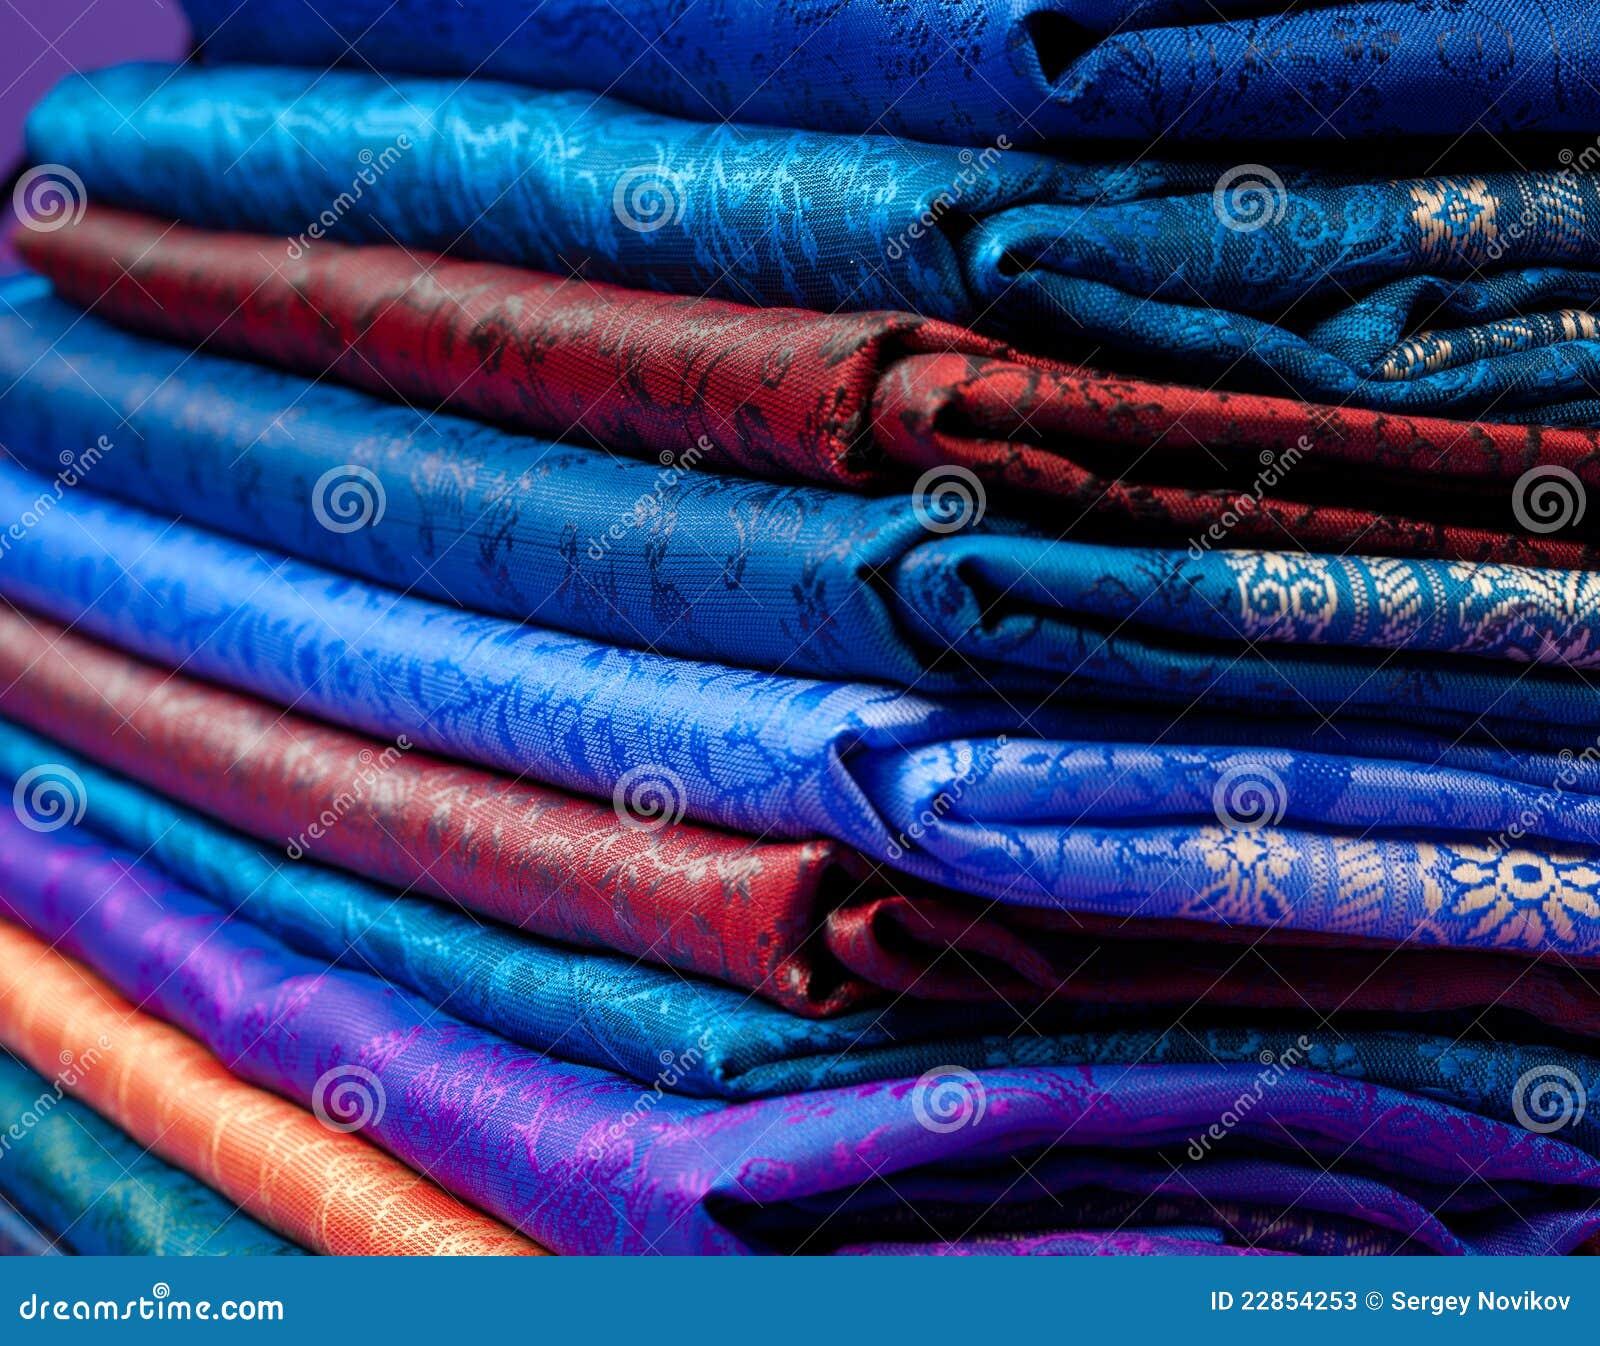 uk availability 85ab3 3350f Seta indiana piegata immagine stock. Immagine di vestiti ...